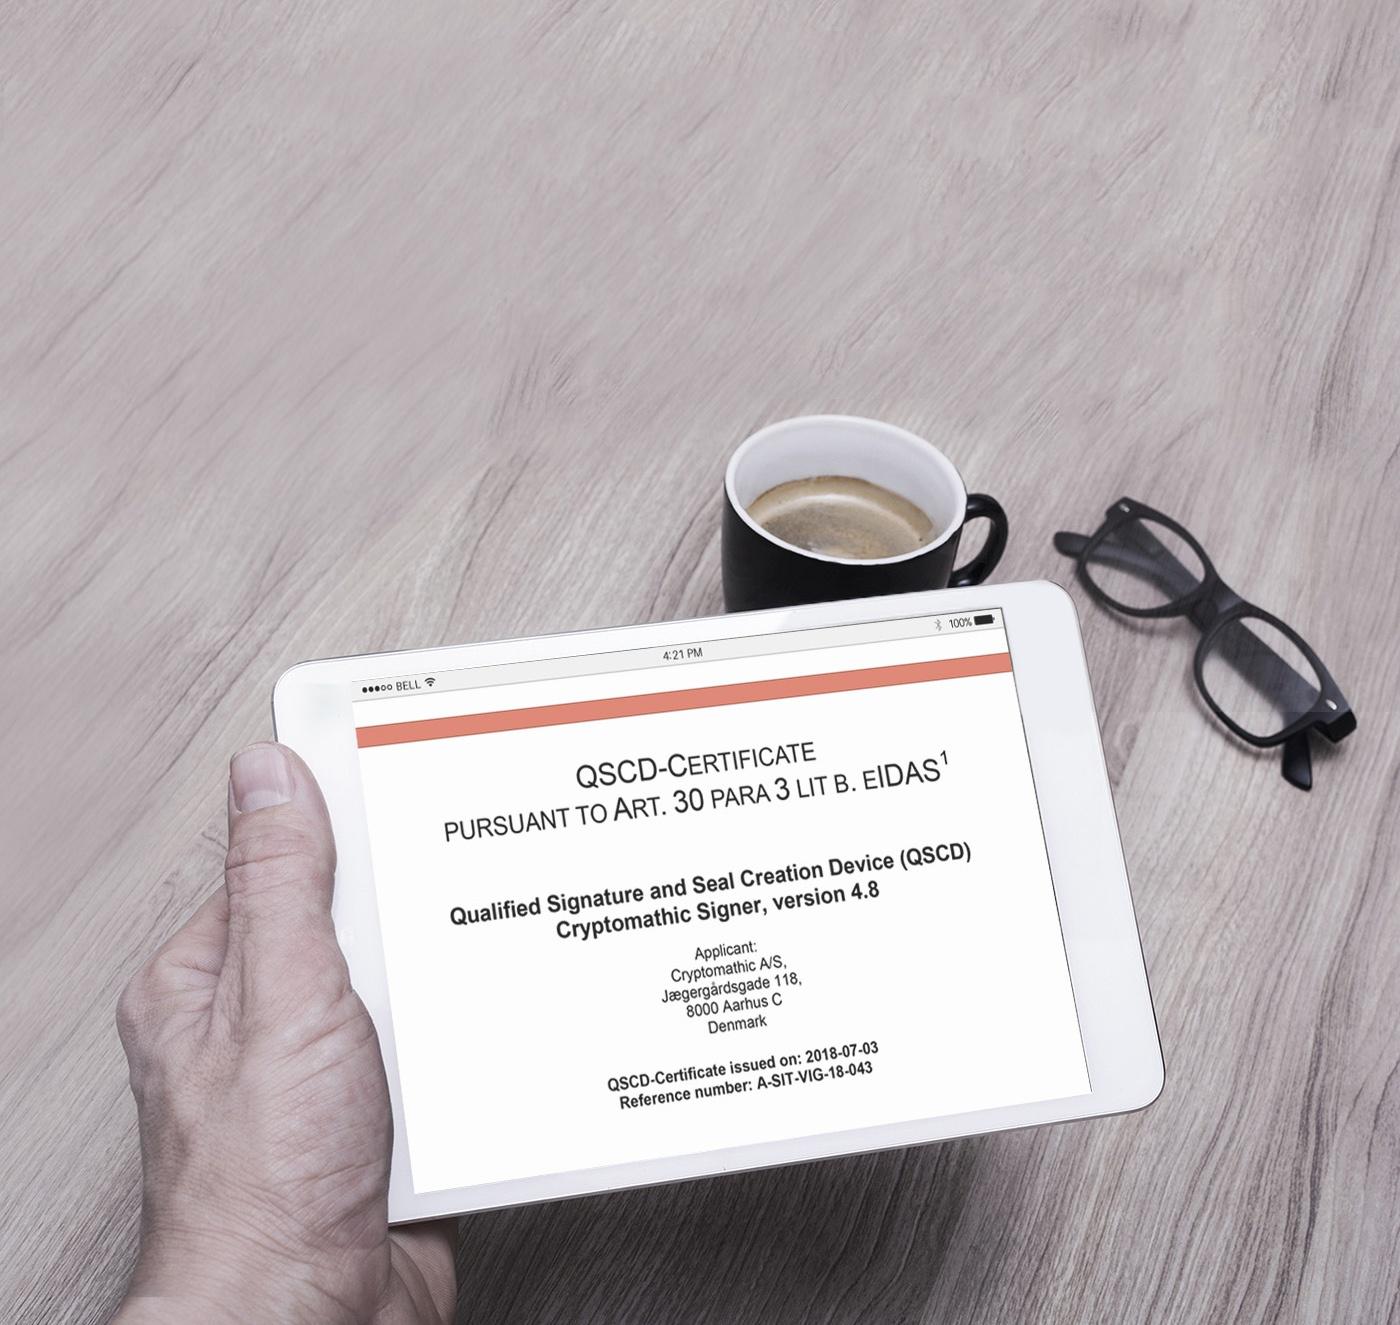 QSCD-Certificate